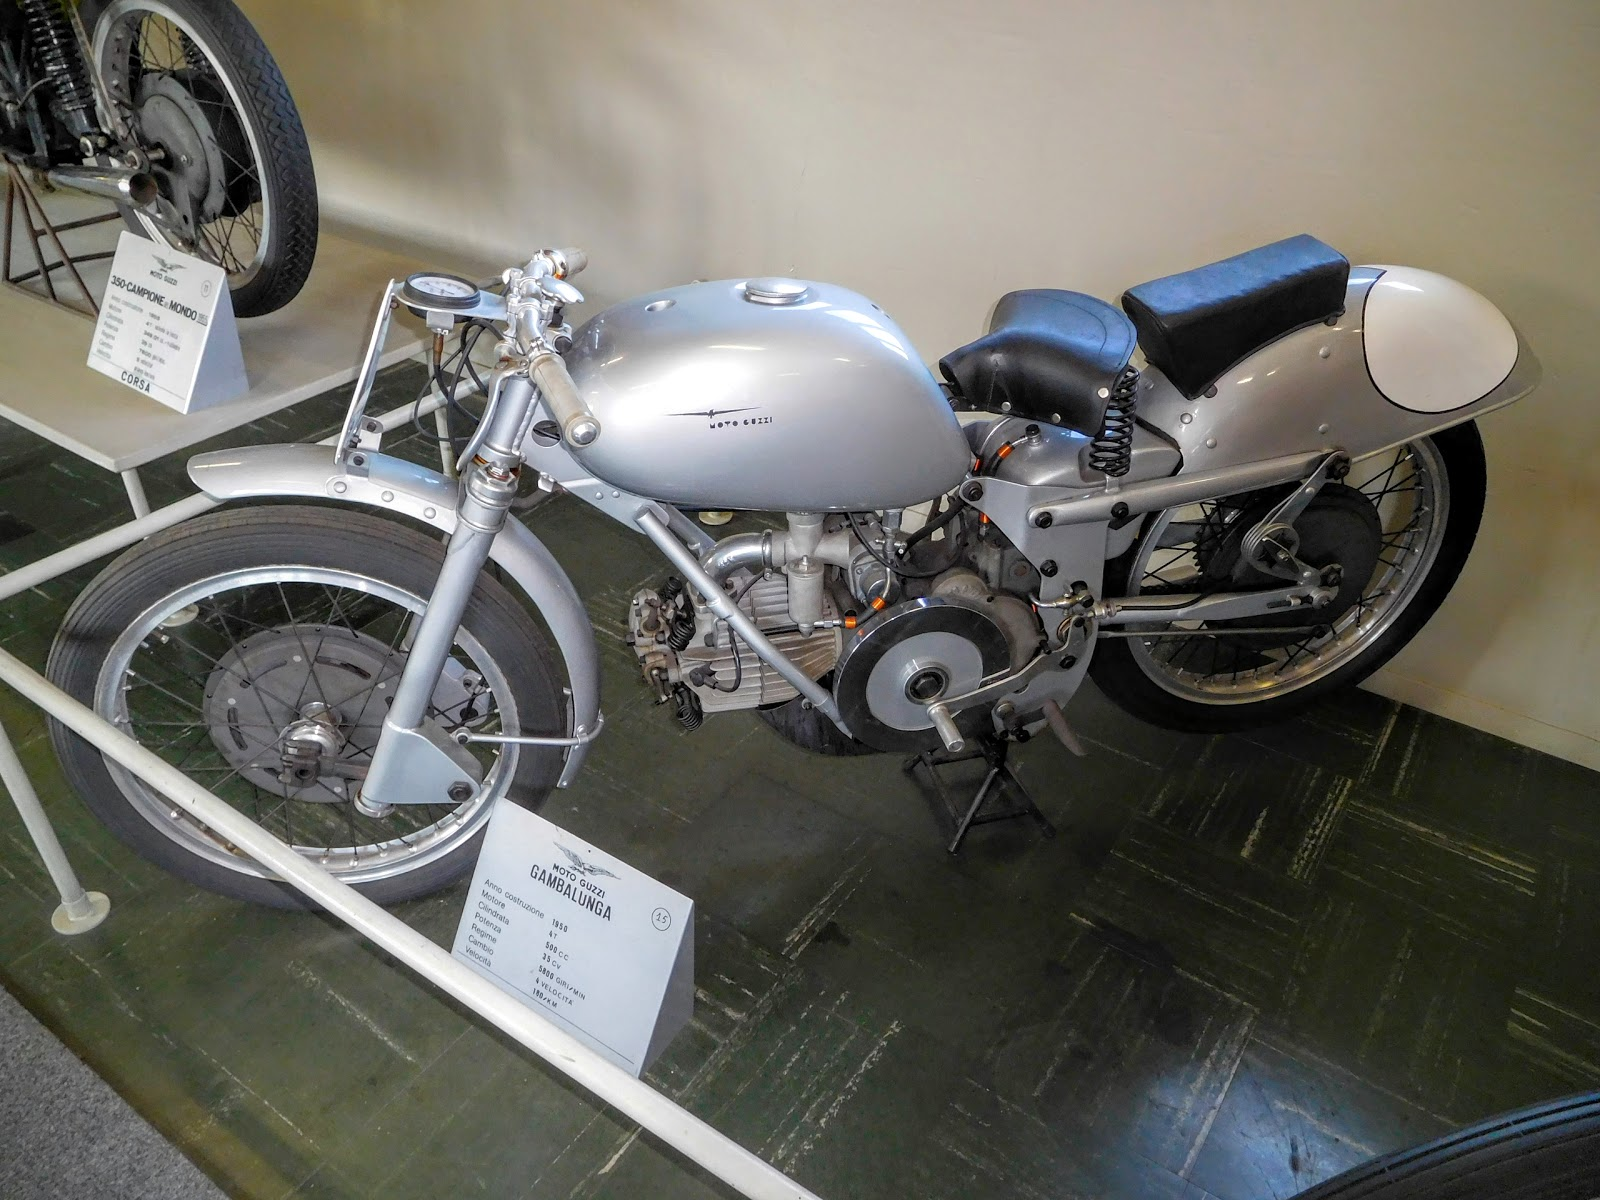 Tigho NYDucati: 1950 Moto Guzzi Gambalunga